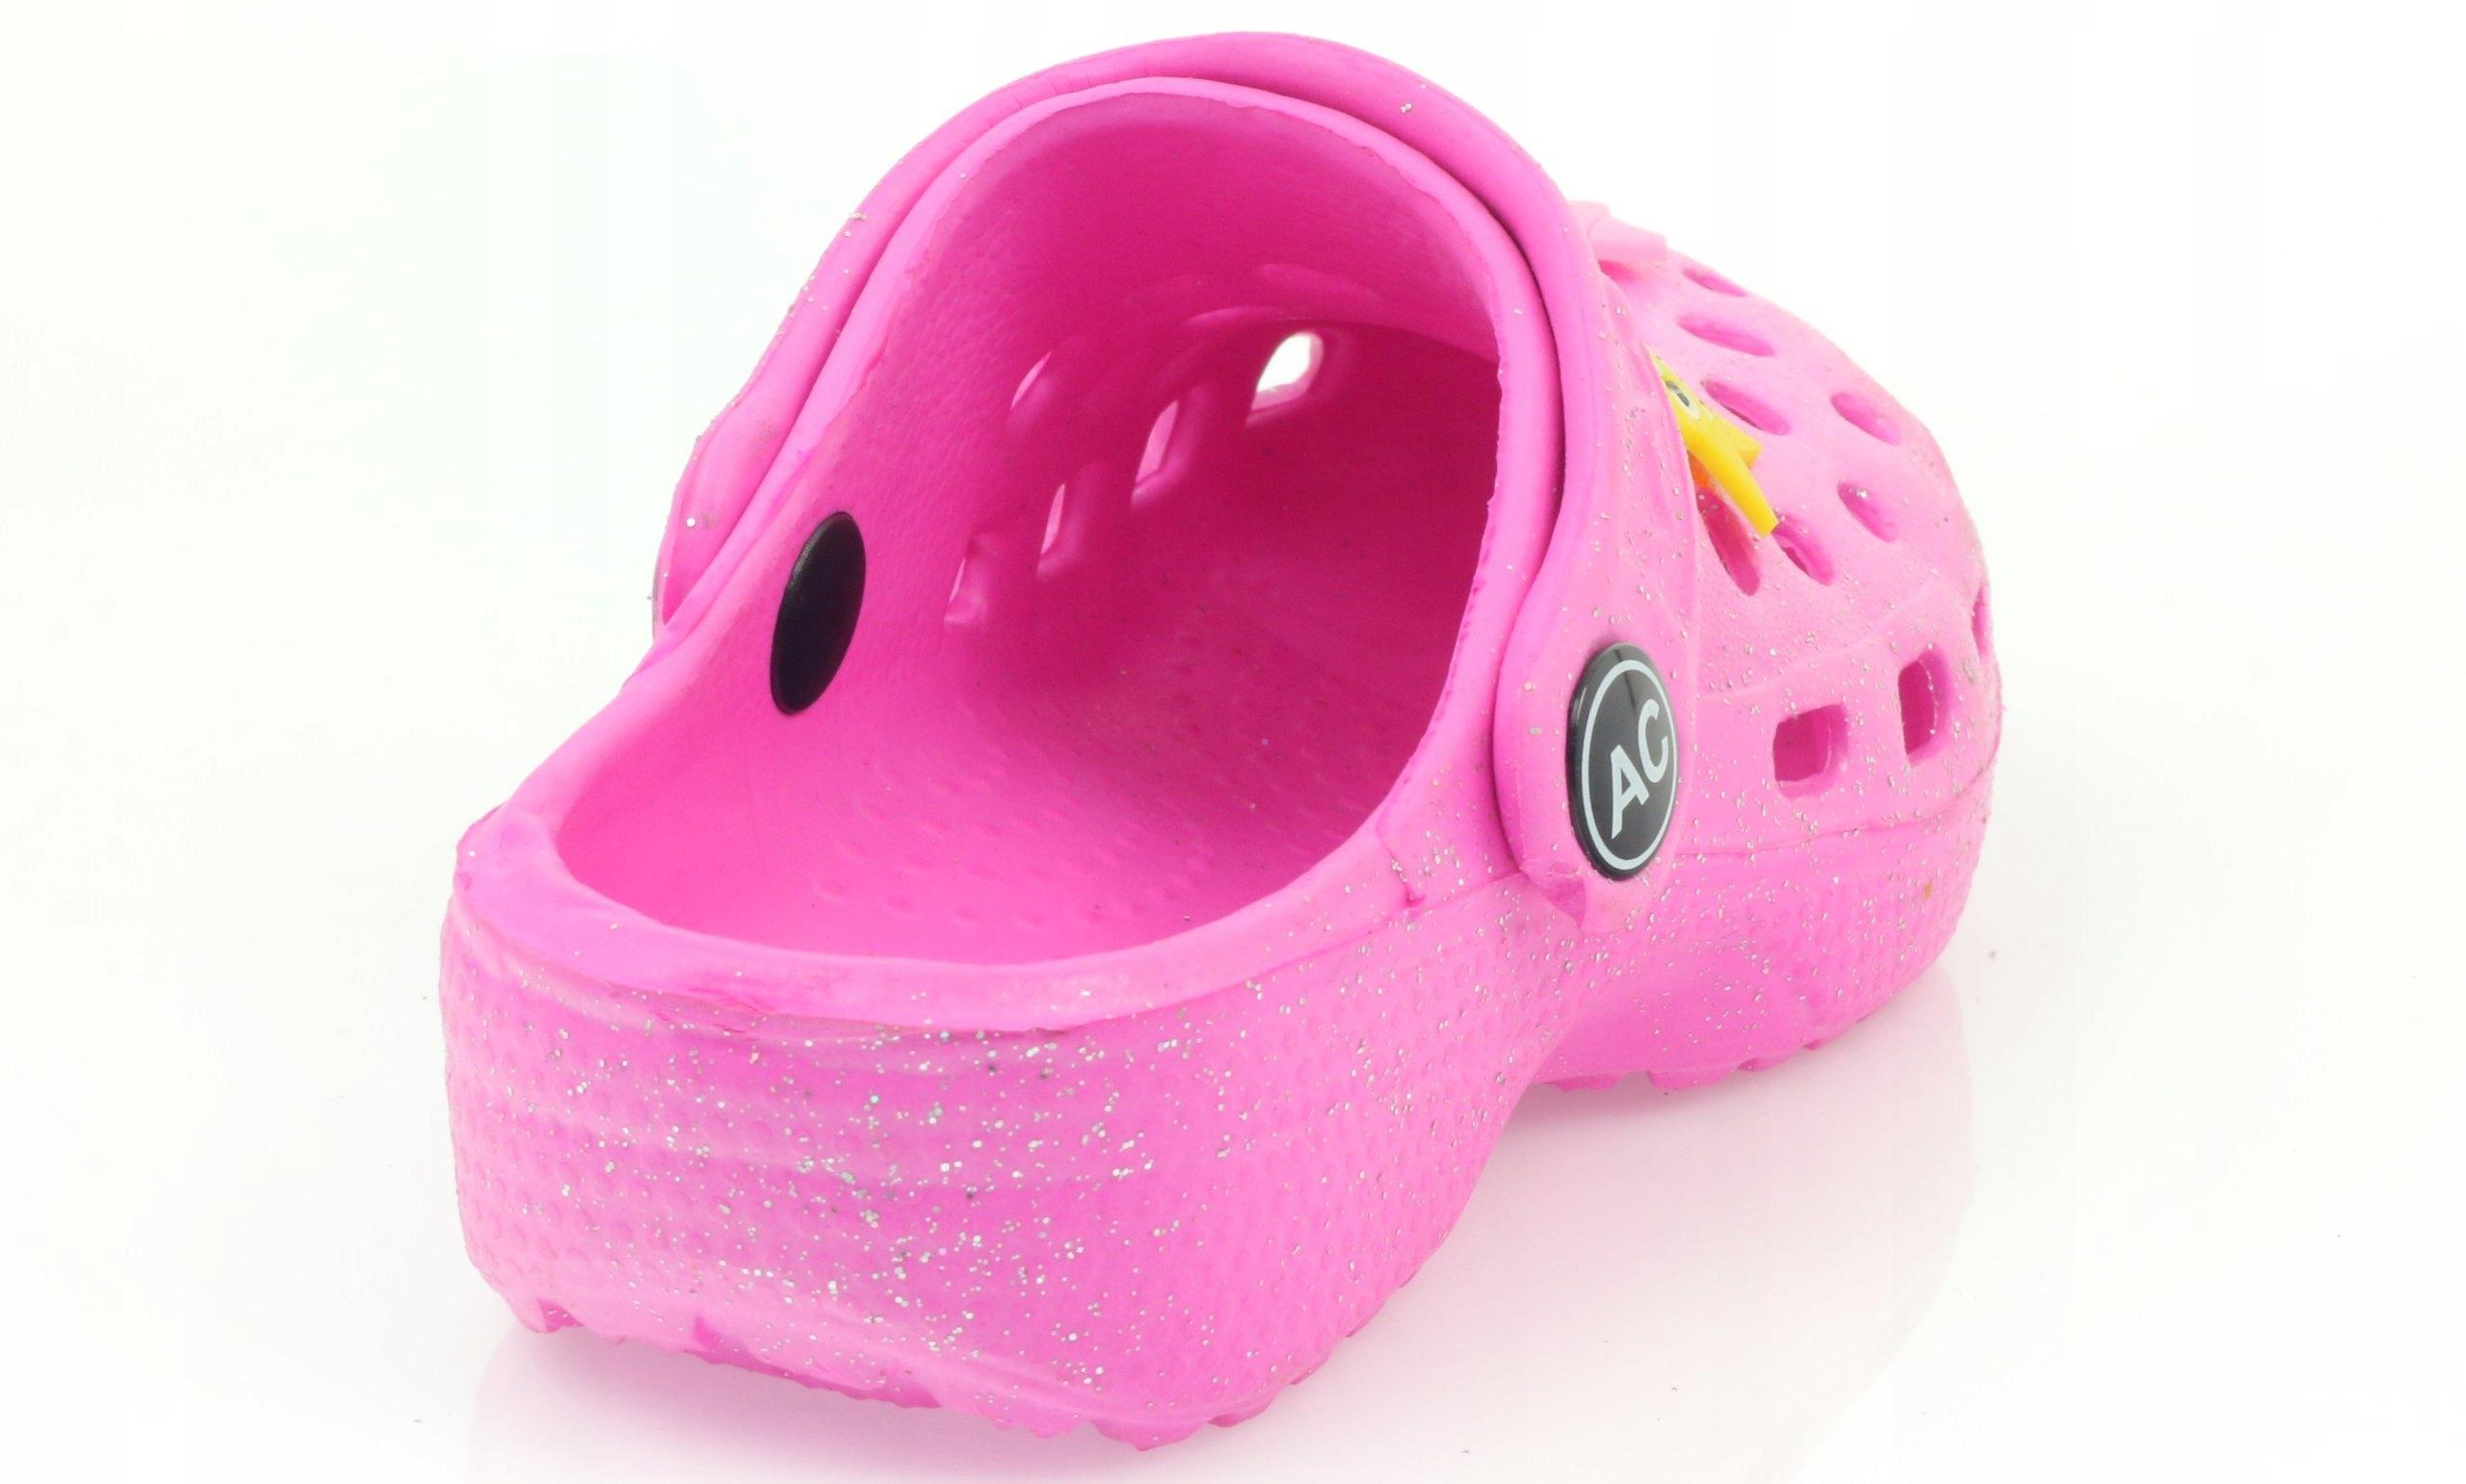 Crocs klapki kroksy różowe American r.29 - 7396561423 - oficjalne ... 86e3b3678d